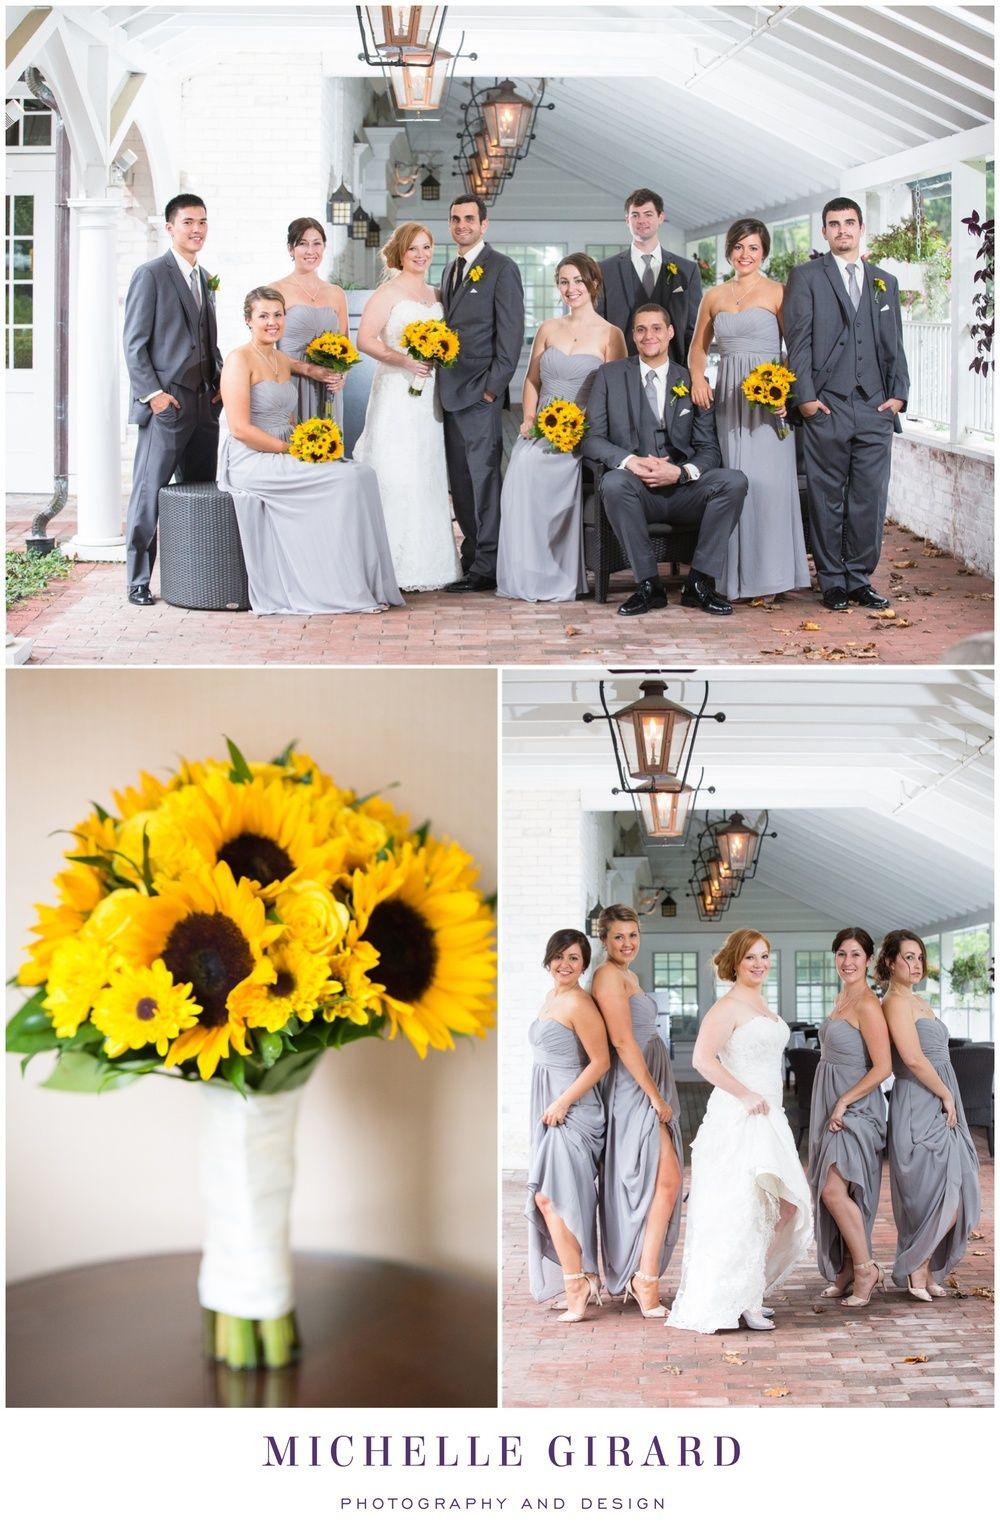 Burgundy and Grey Wedding with Sunflowers